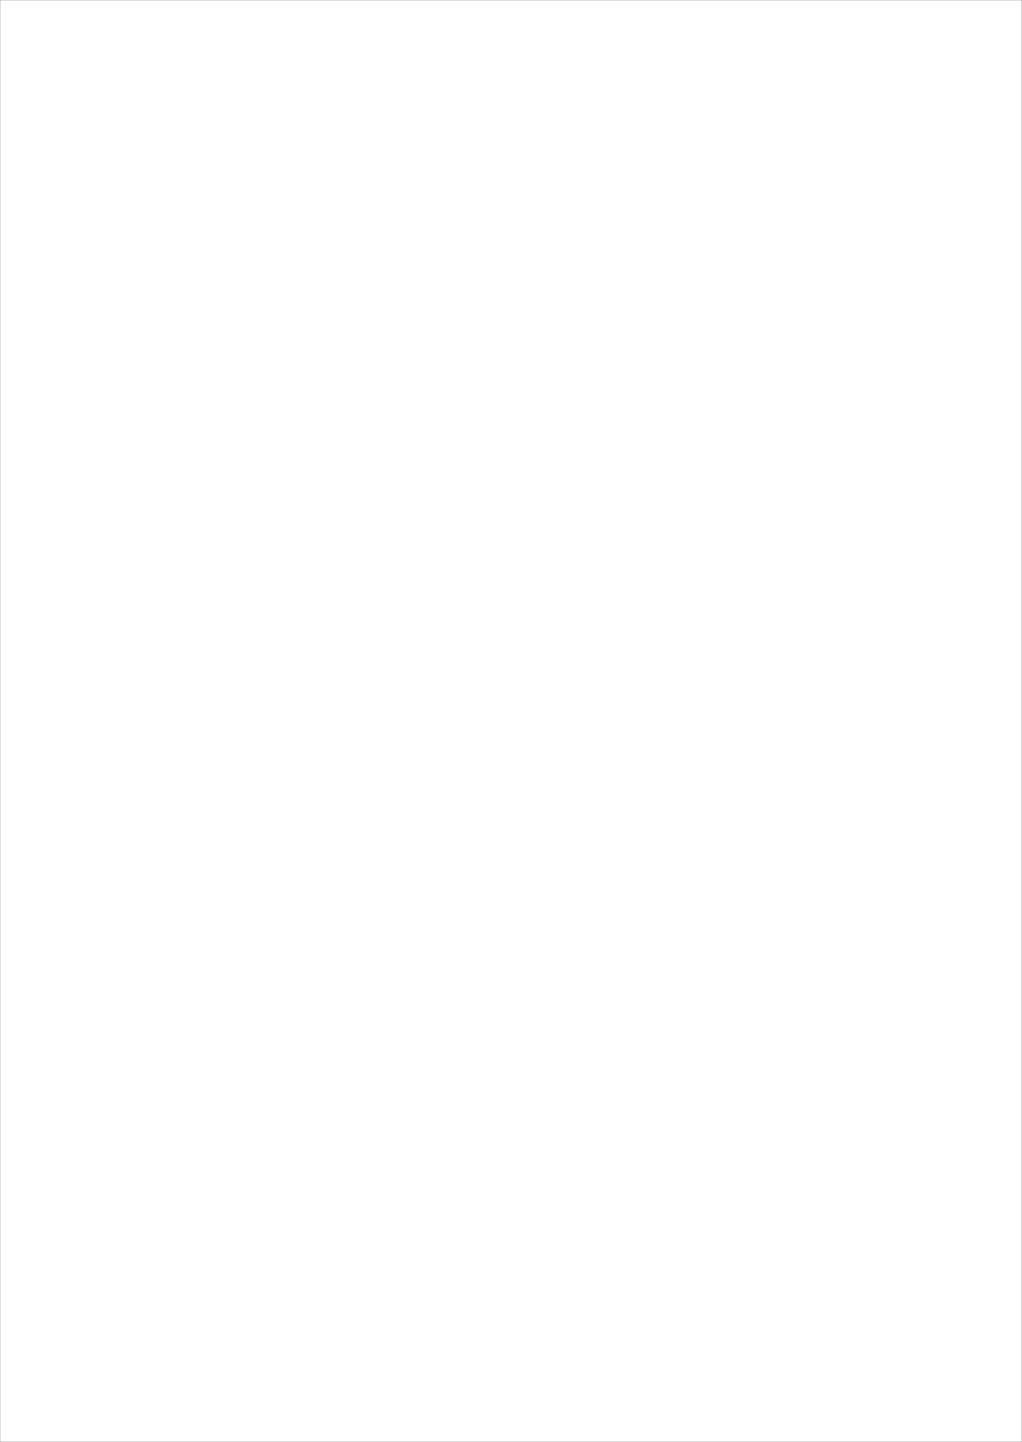 Kiyohime Lovers Vol. 01 - Kiyohime to Hajimete 20